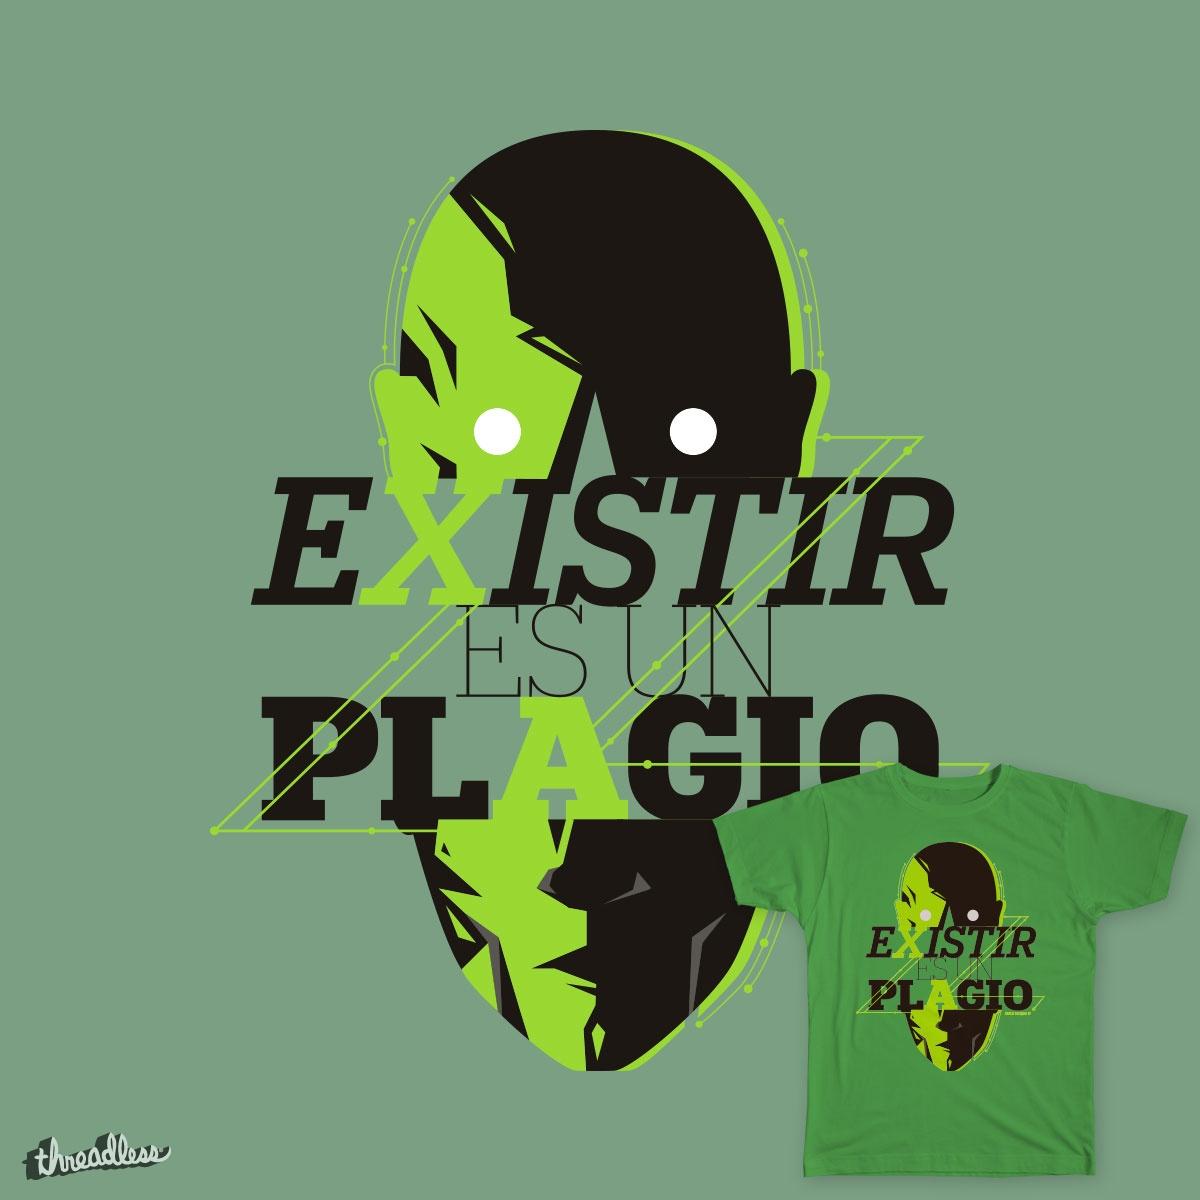 Existir es un palgio. by bpires on Threadless